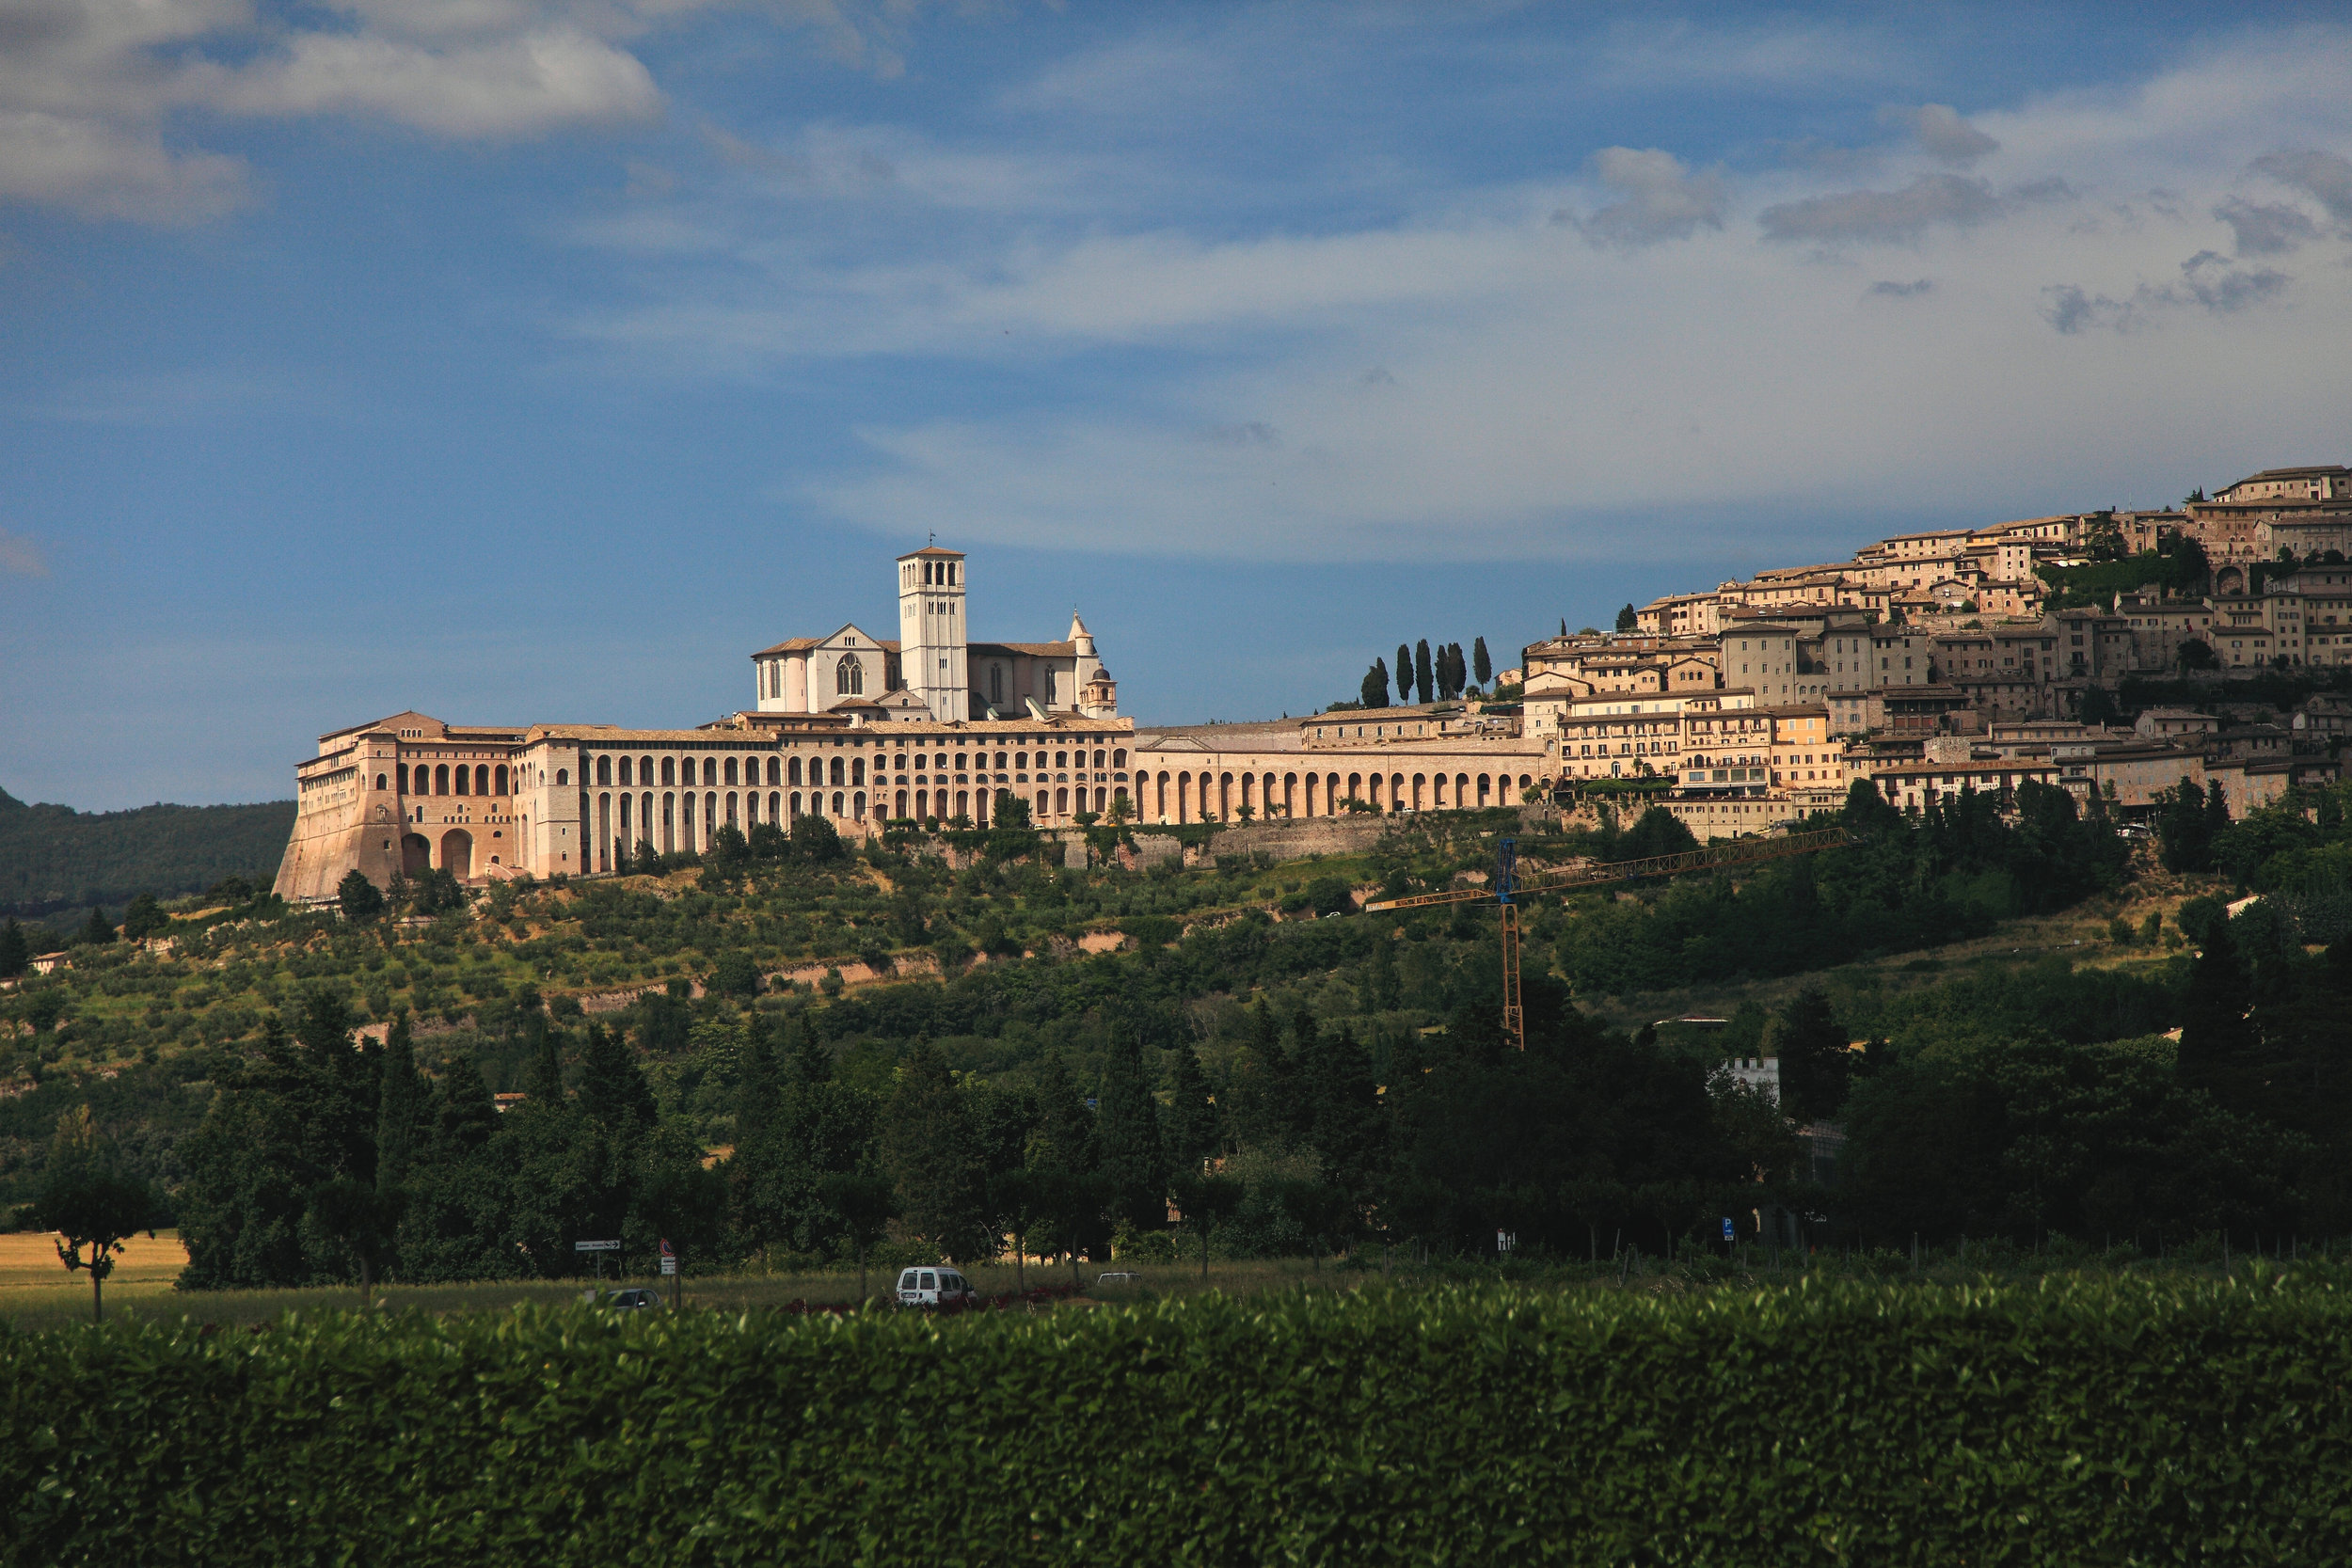 The Basilica di San Francesco d'Assisi